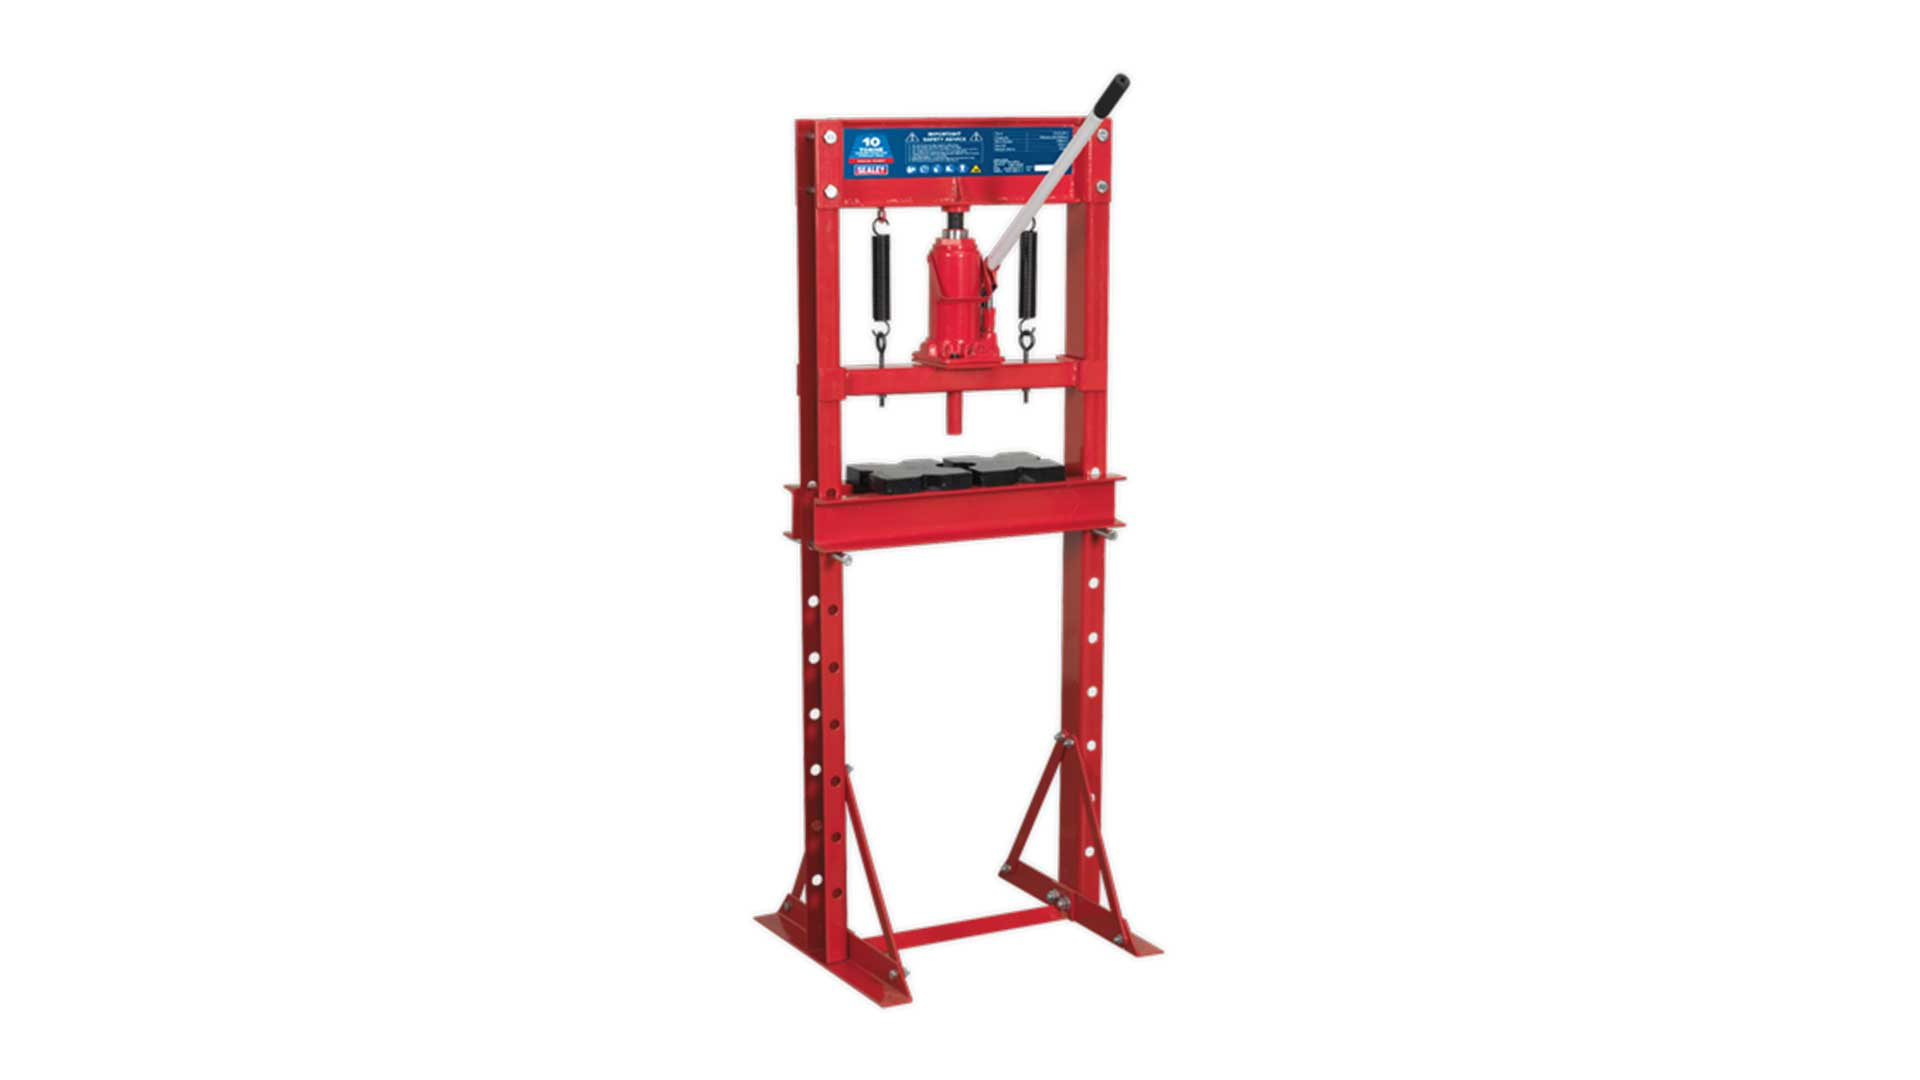 sealey yk10ecf economy floor type hydraulic press